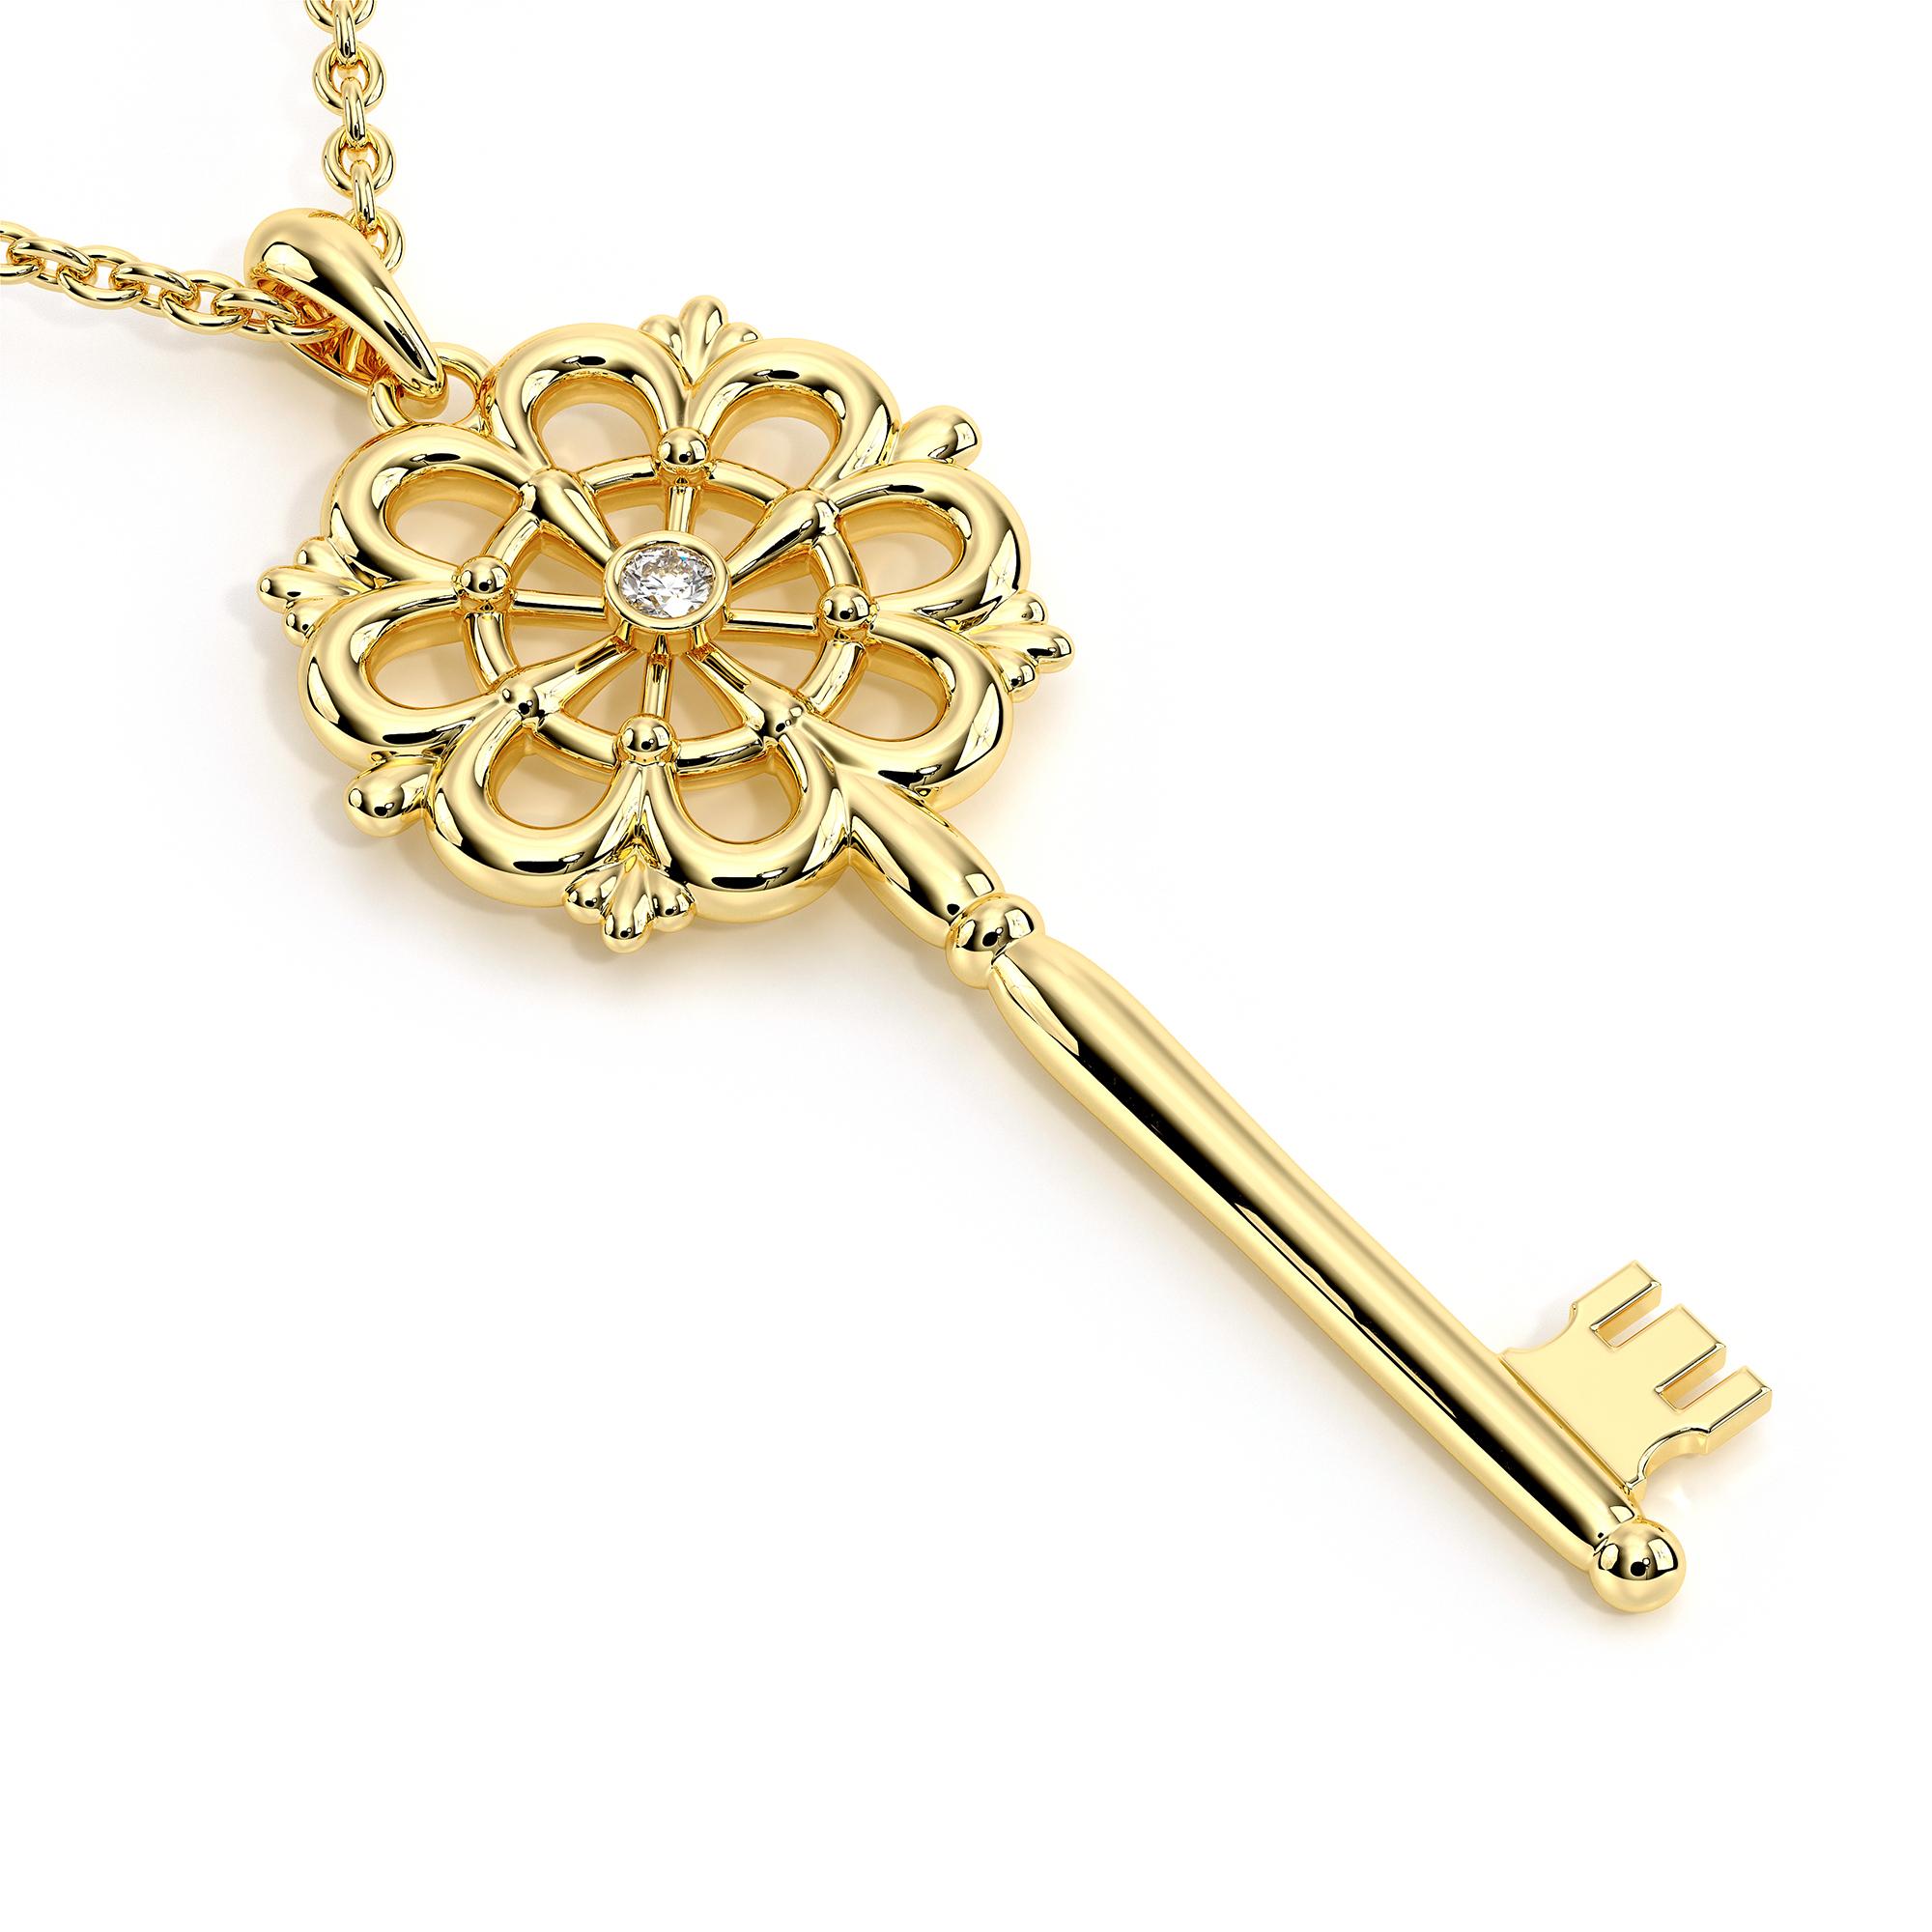 Shiny Gold Key Pendant Unique Diamond Necklace Fine Jewelry Gold Filigree Key